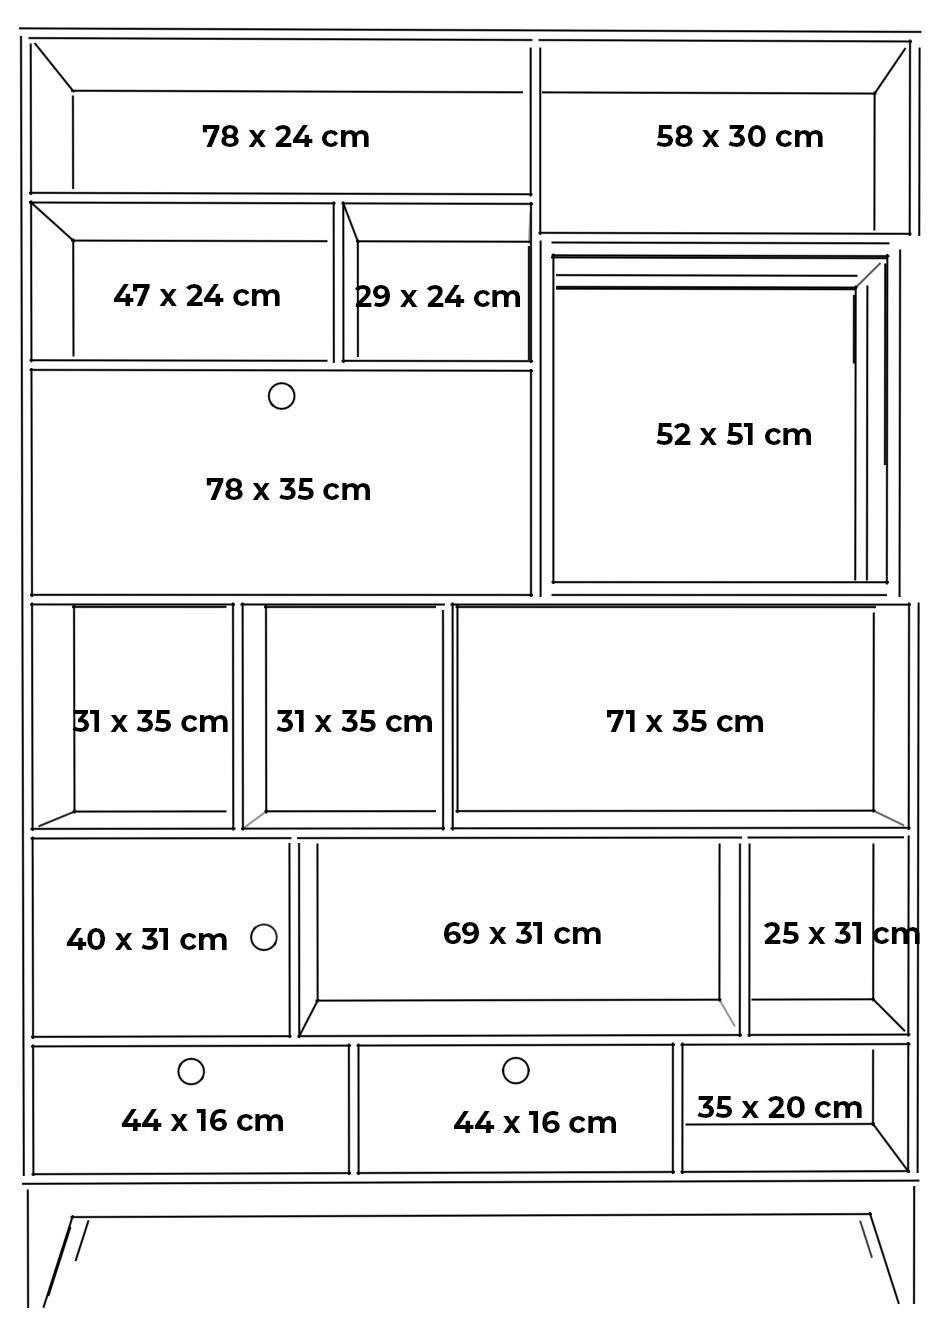 plywood bookcase shelving unit measurements